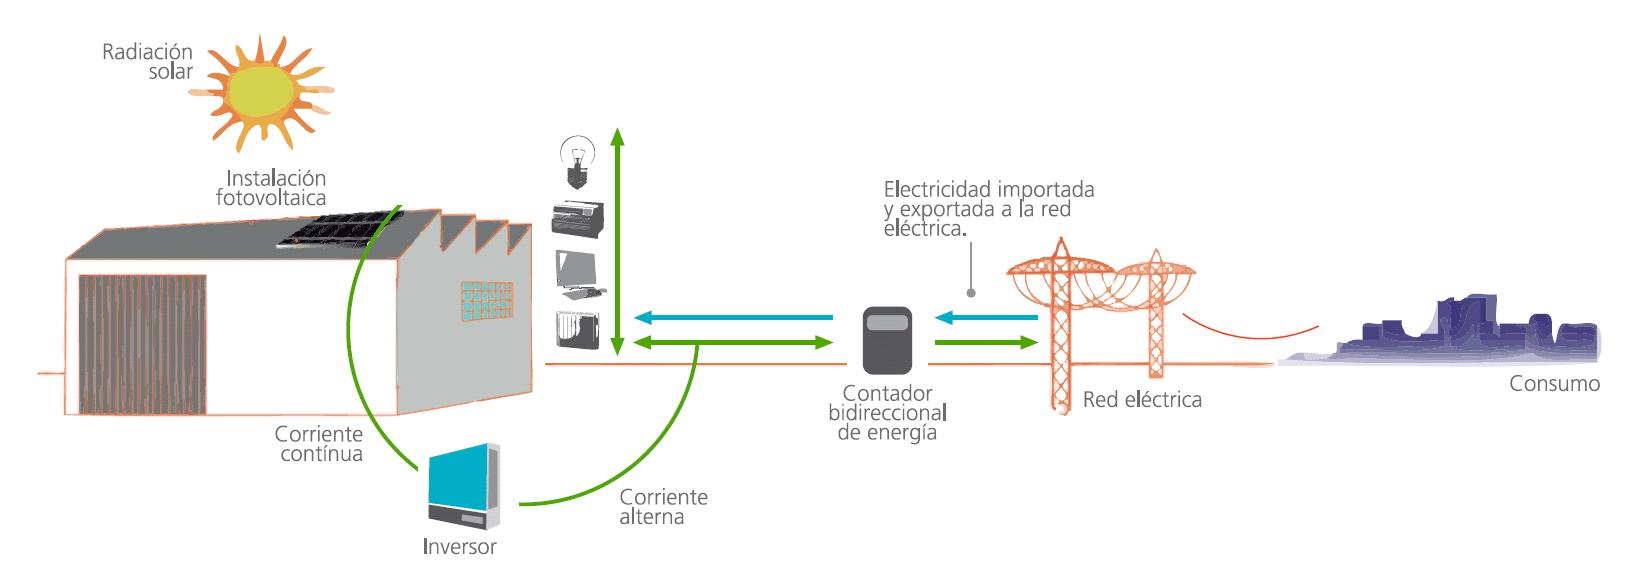 Energía solar Energes